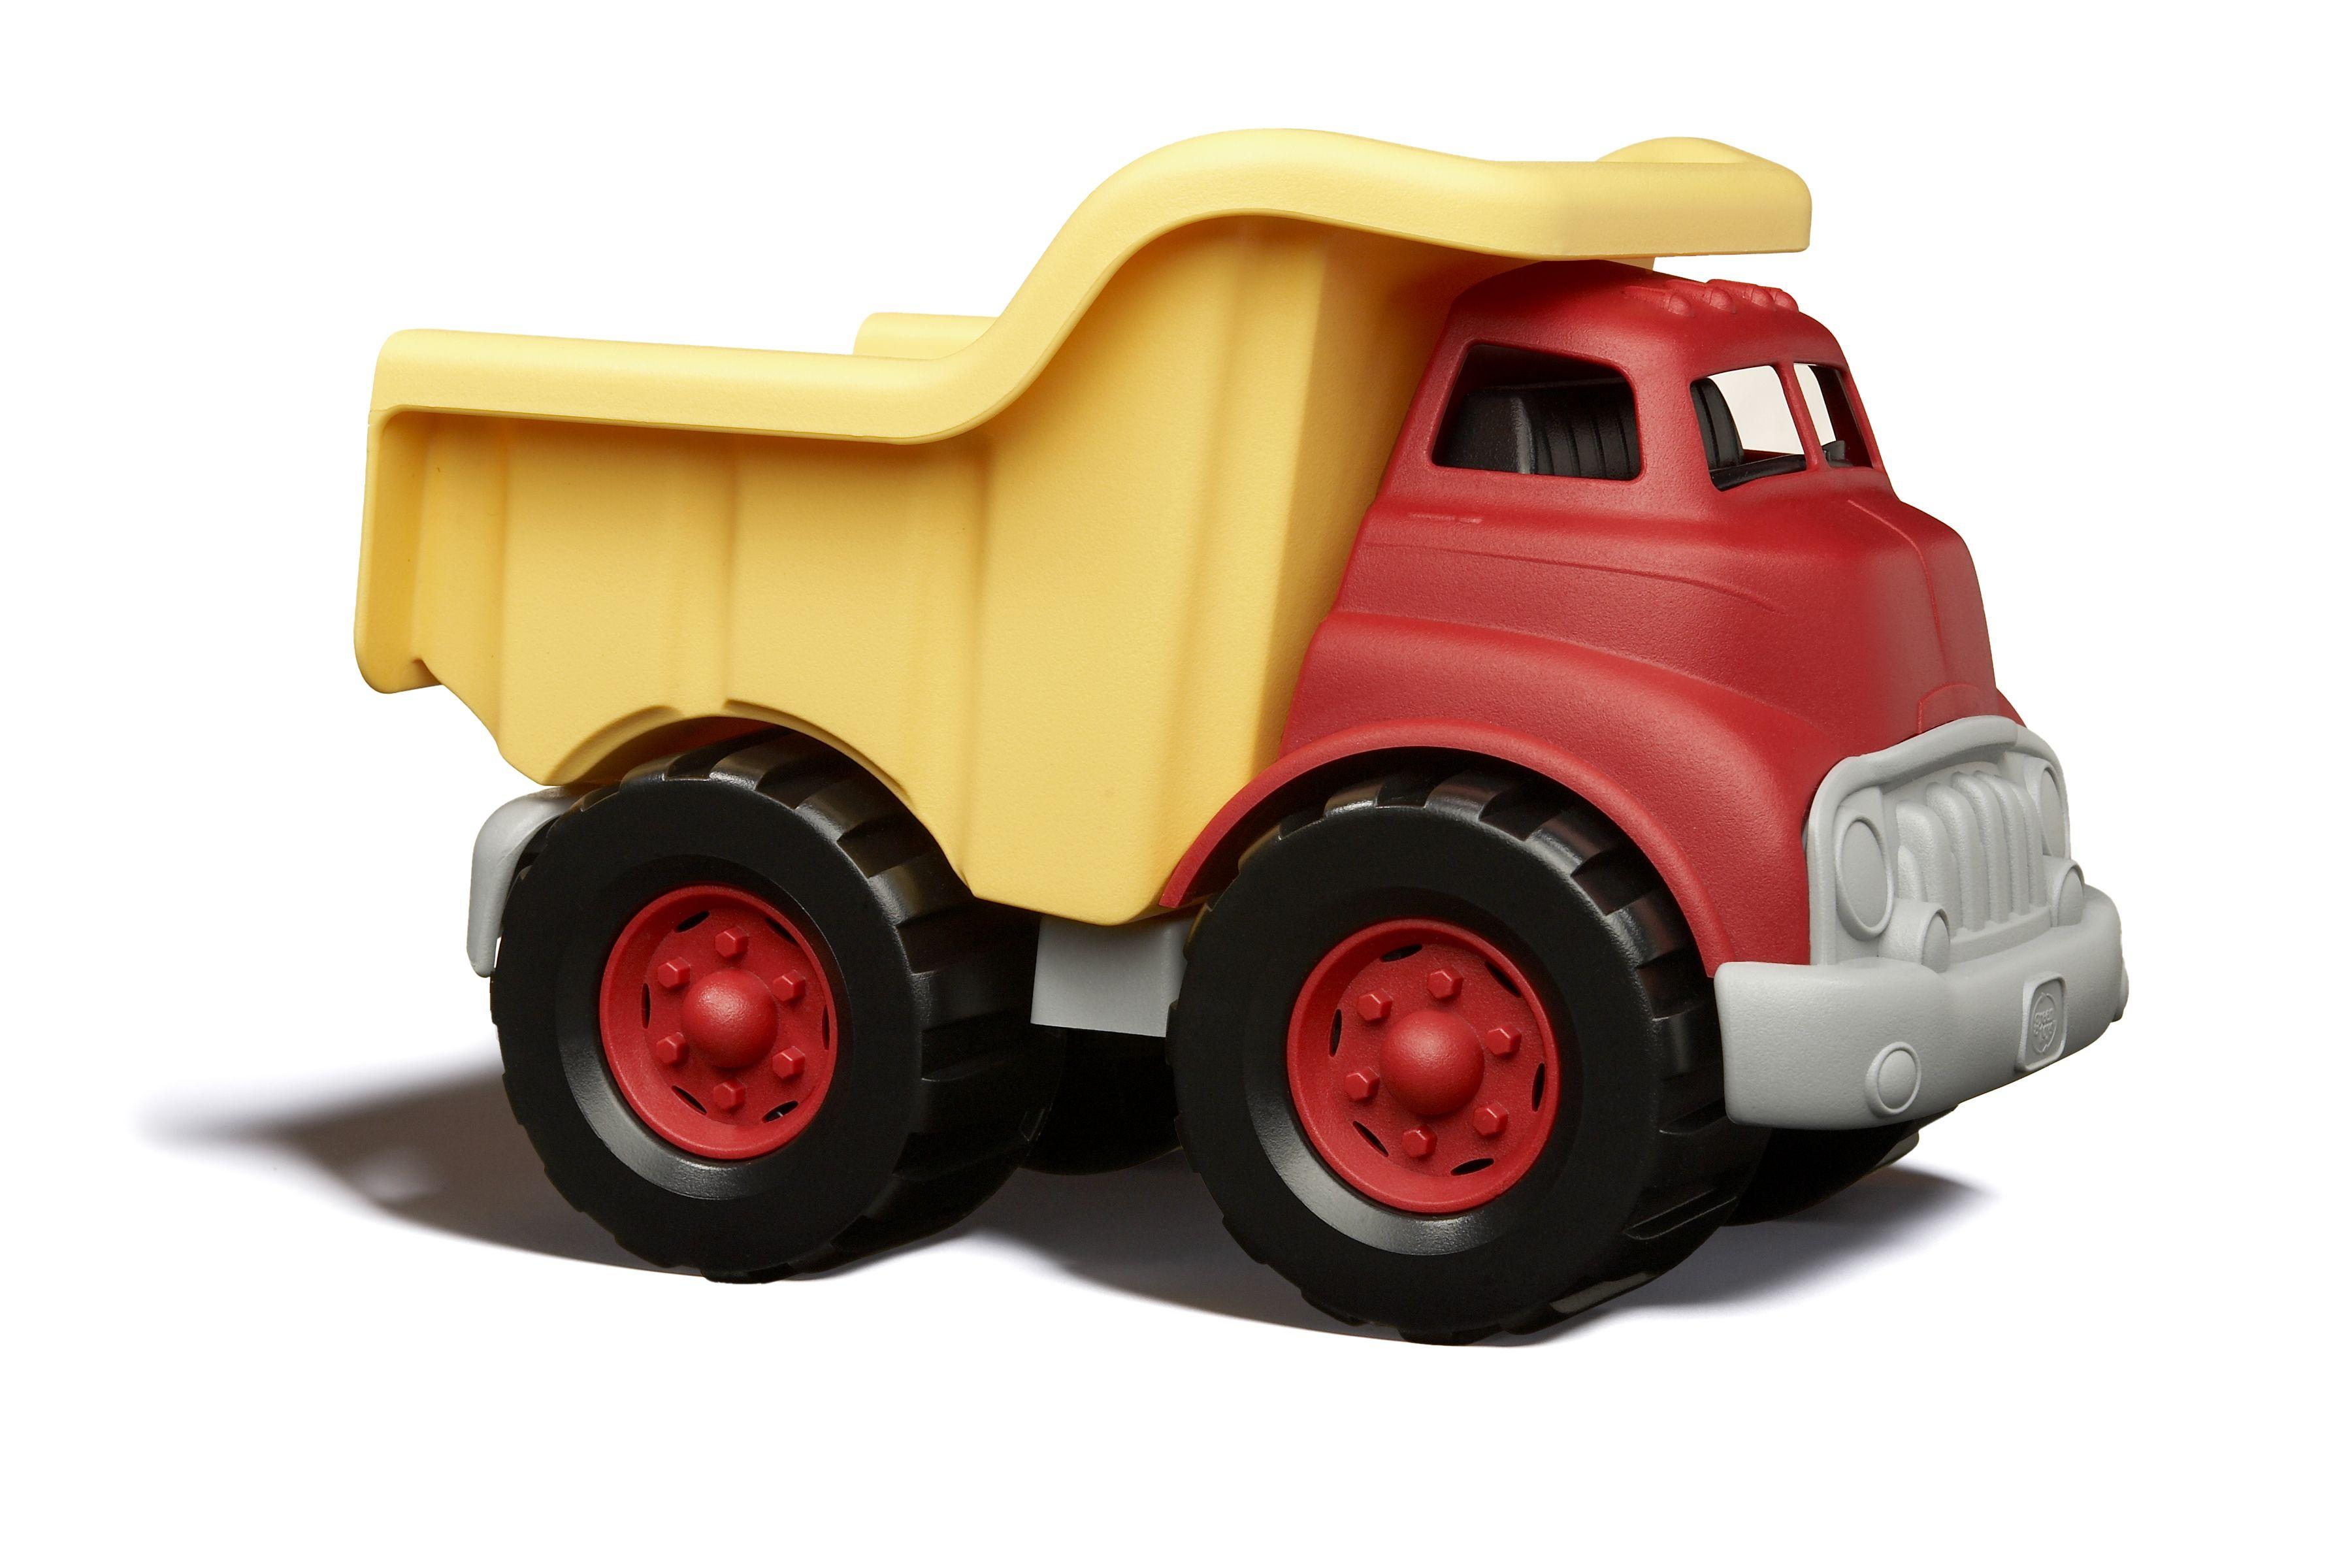 Toys car and truck  Vehicles  Green Toys  Gift Ideas  Tiny Trucker  Pinterest